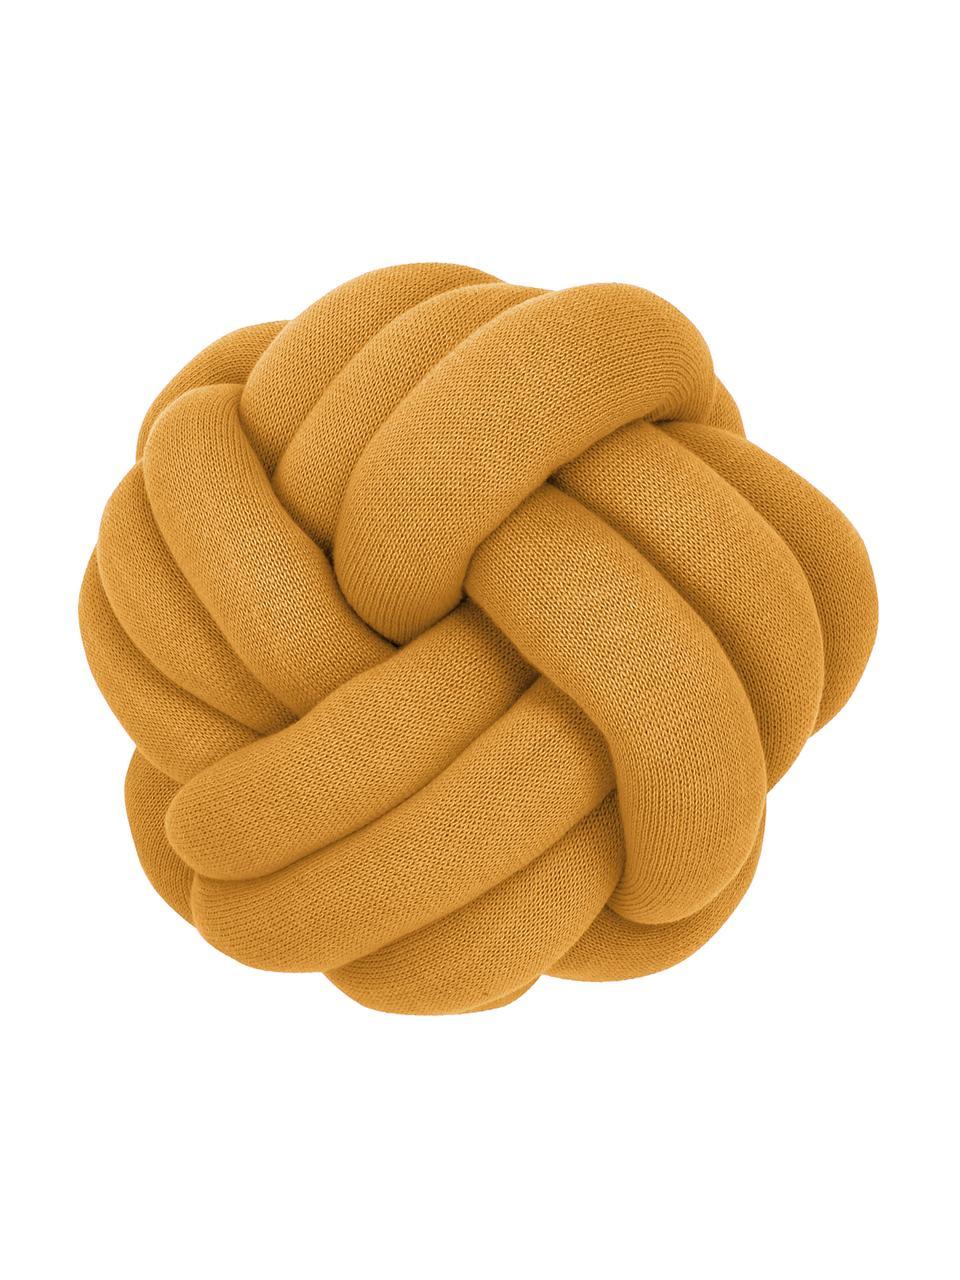 Coussin nœud Twist, Jaune moutarde